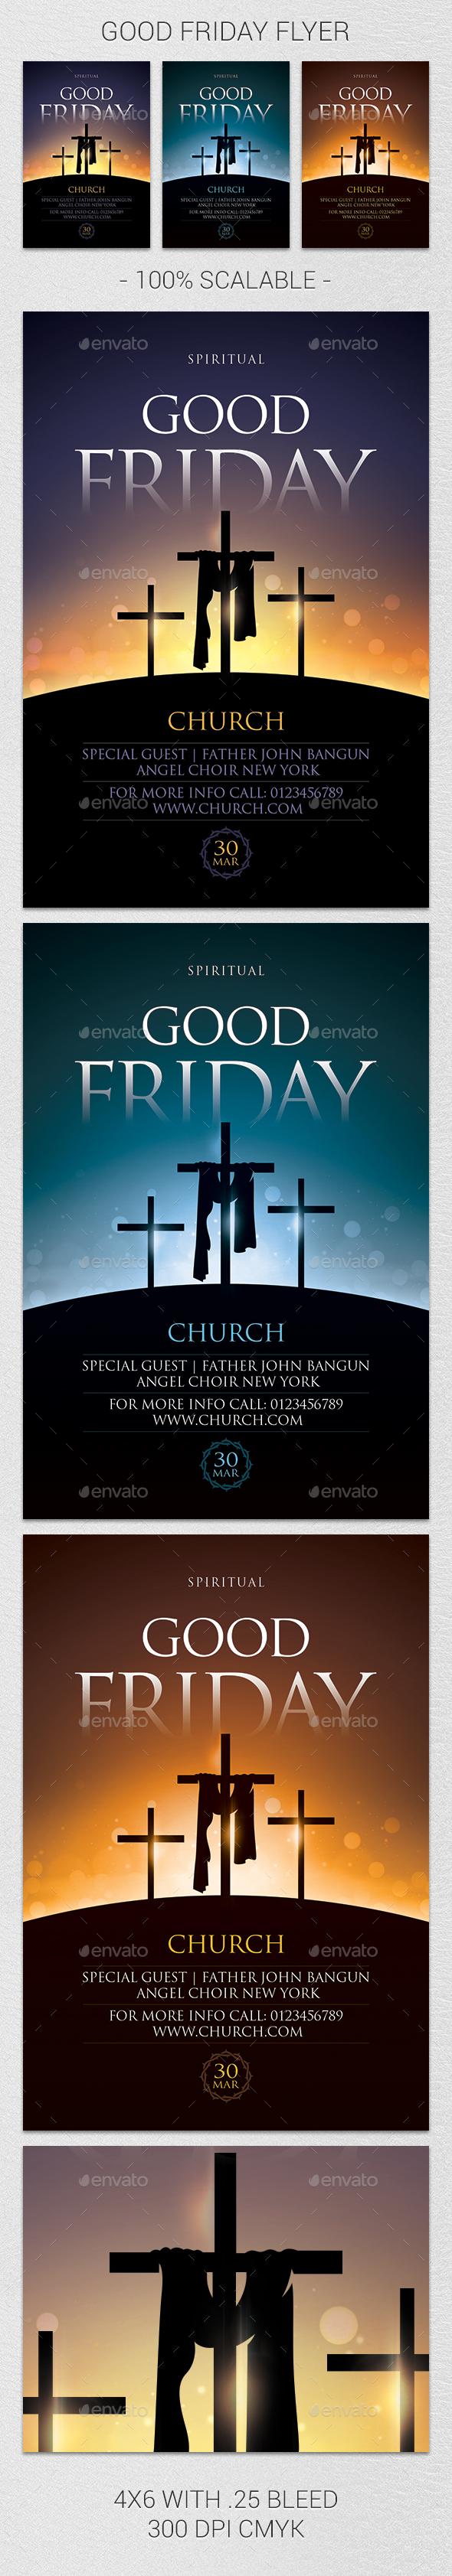 Good Friday Flyer - Church Flyers